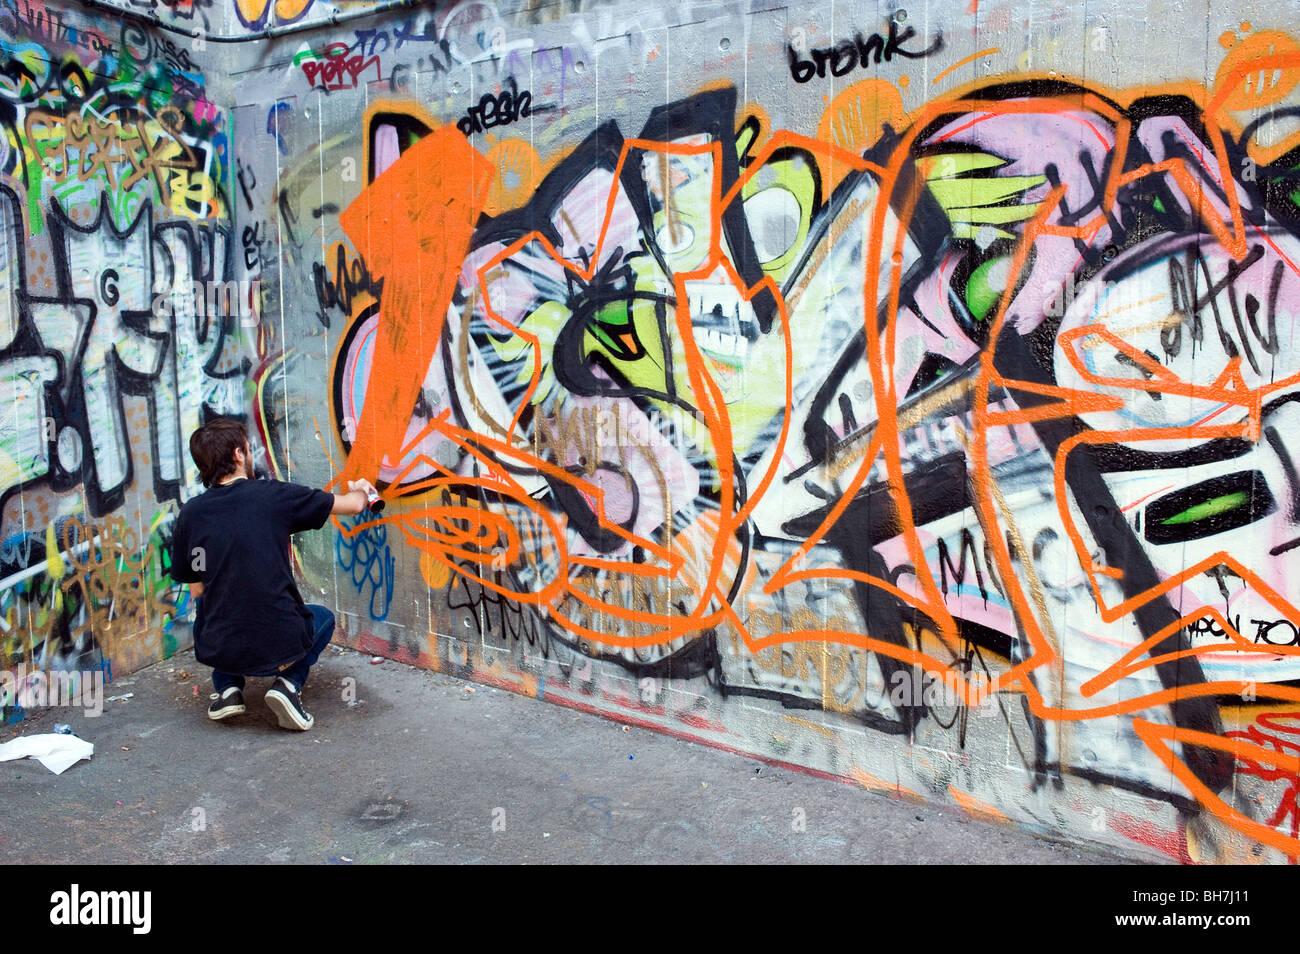 Spray painting graffiti on concrete wall south bank london england uk